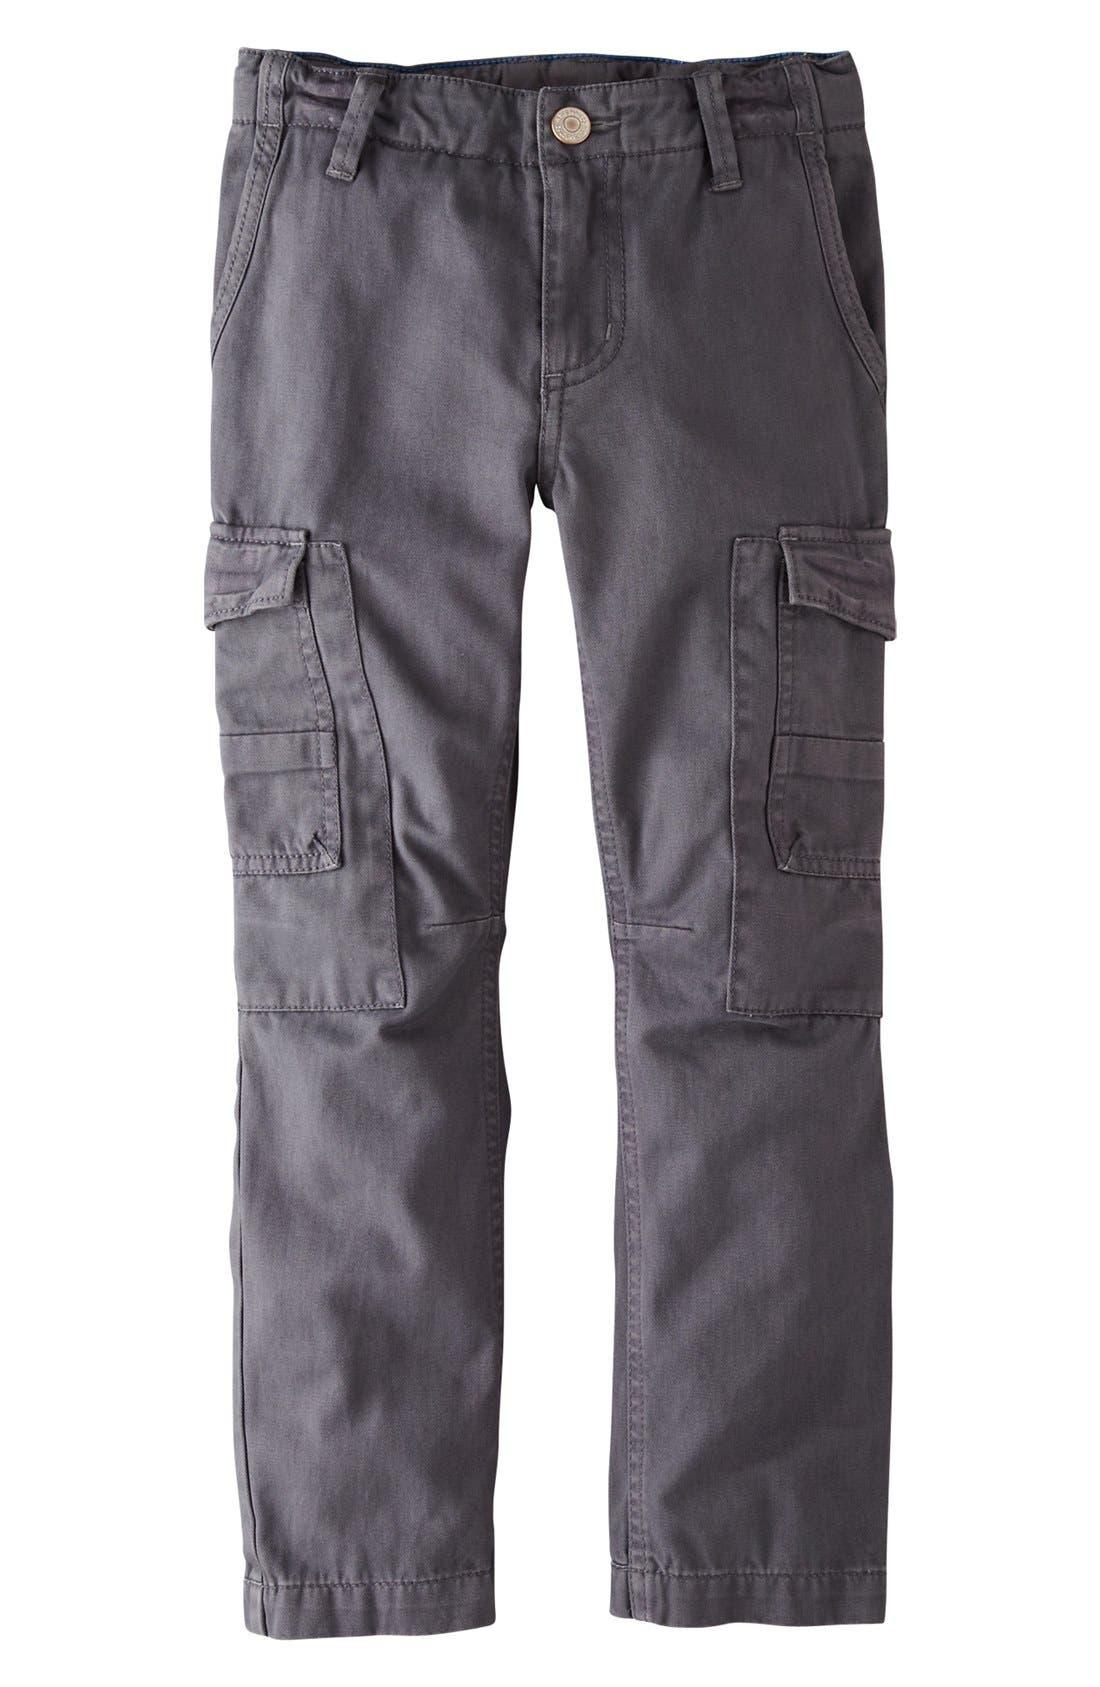 Alternate Image 1 Selected - Mini Boden Slim Fit Cargo Pants (Toddler Boys, Little Boys & Big Boys)